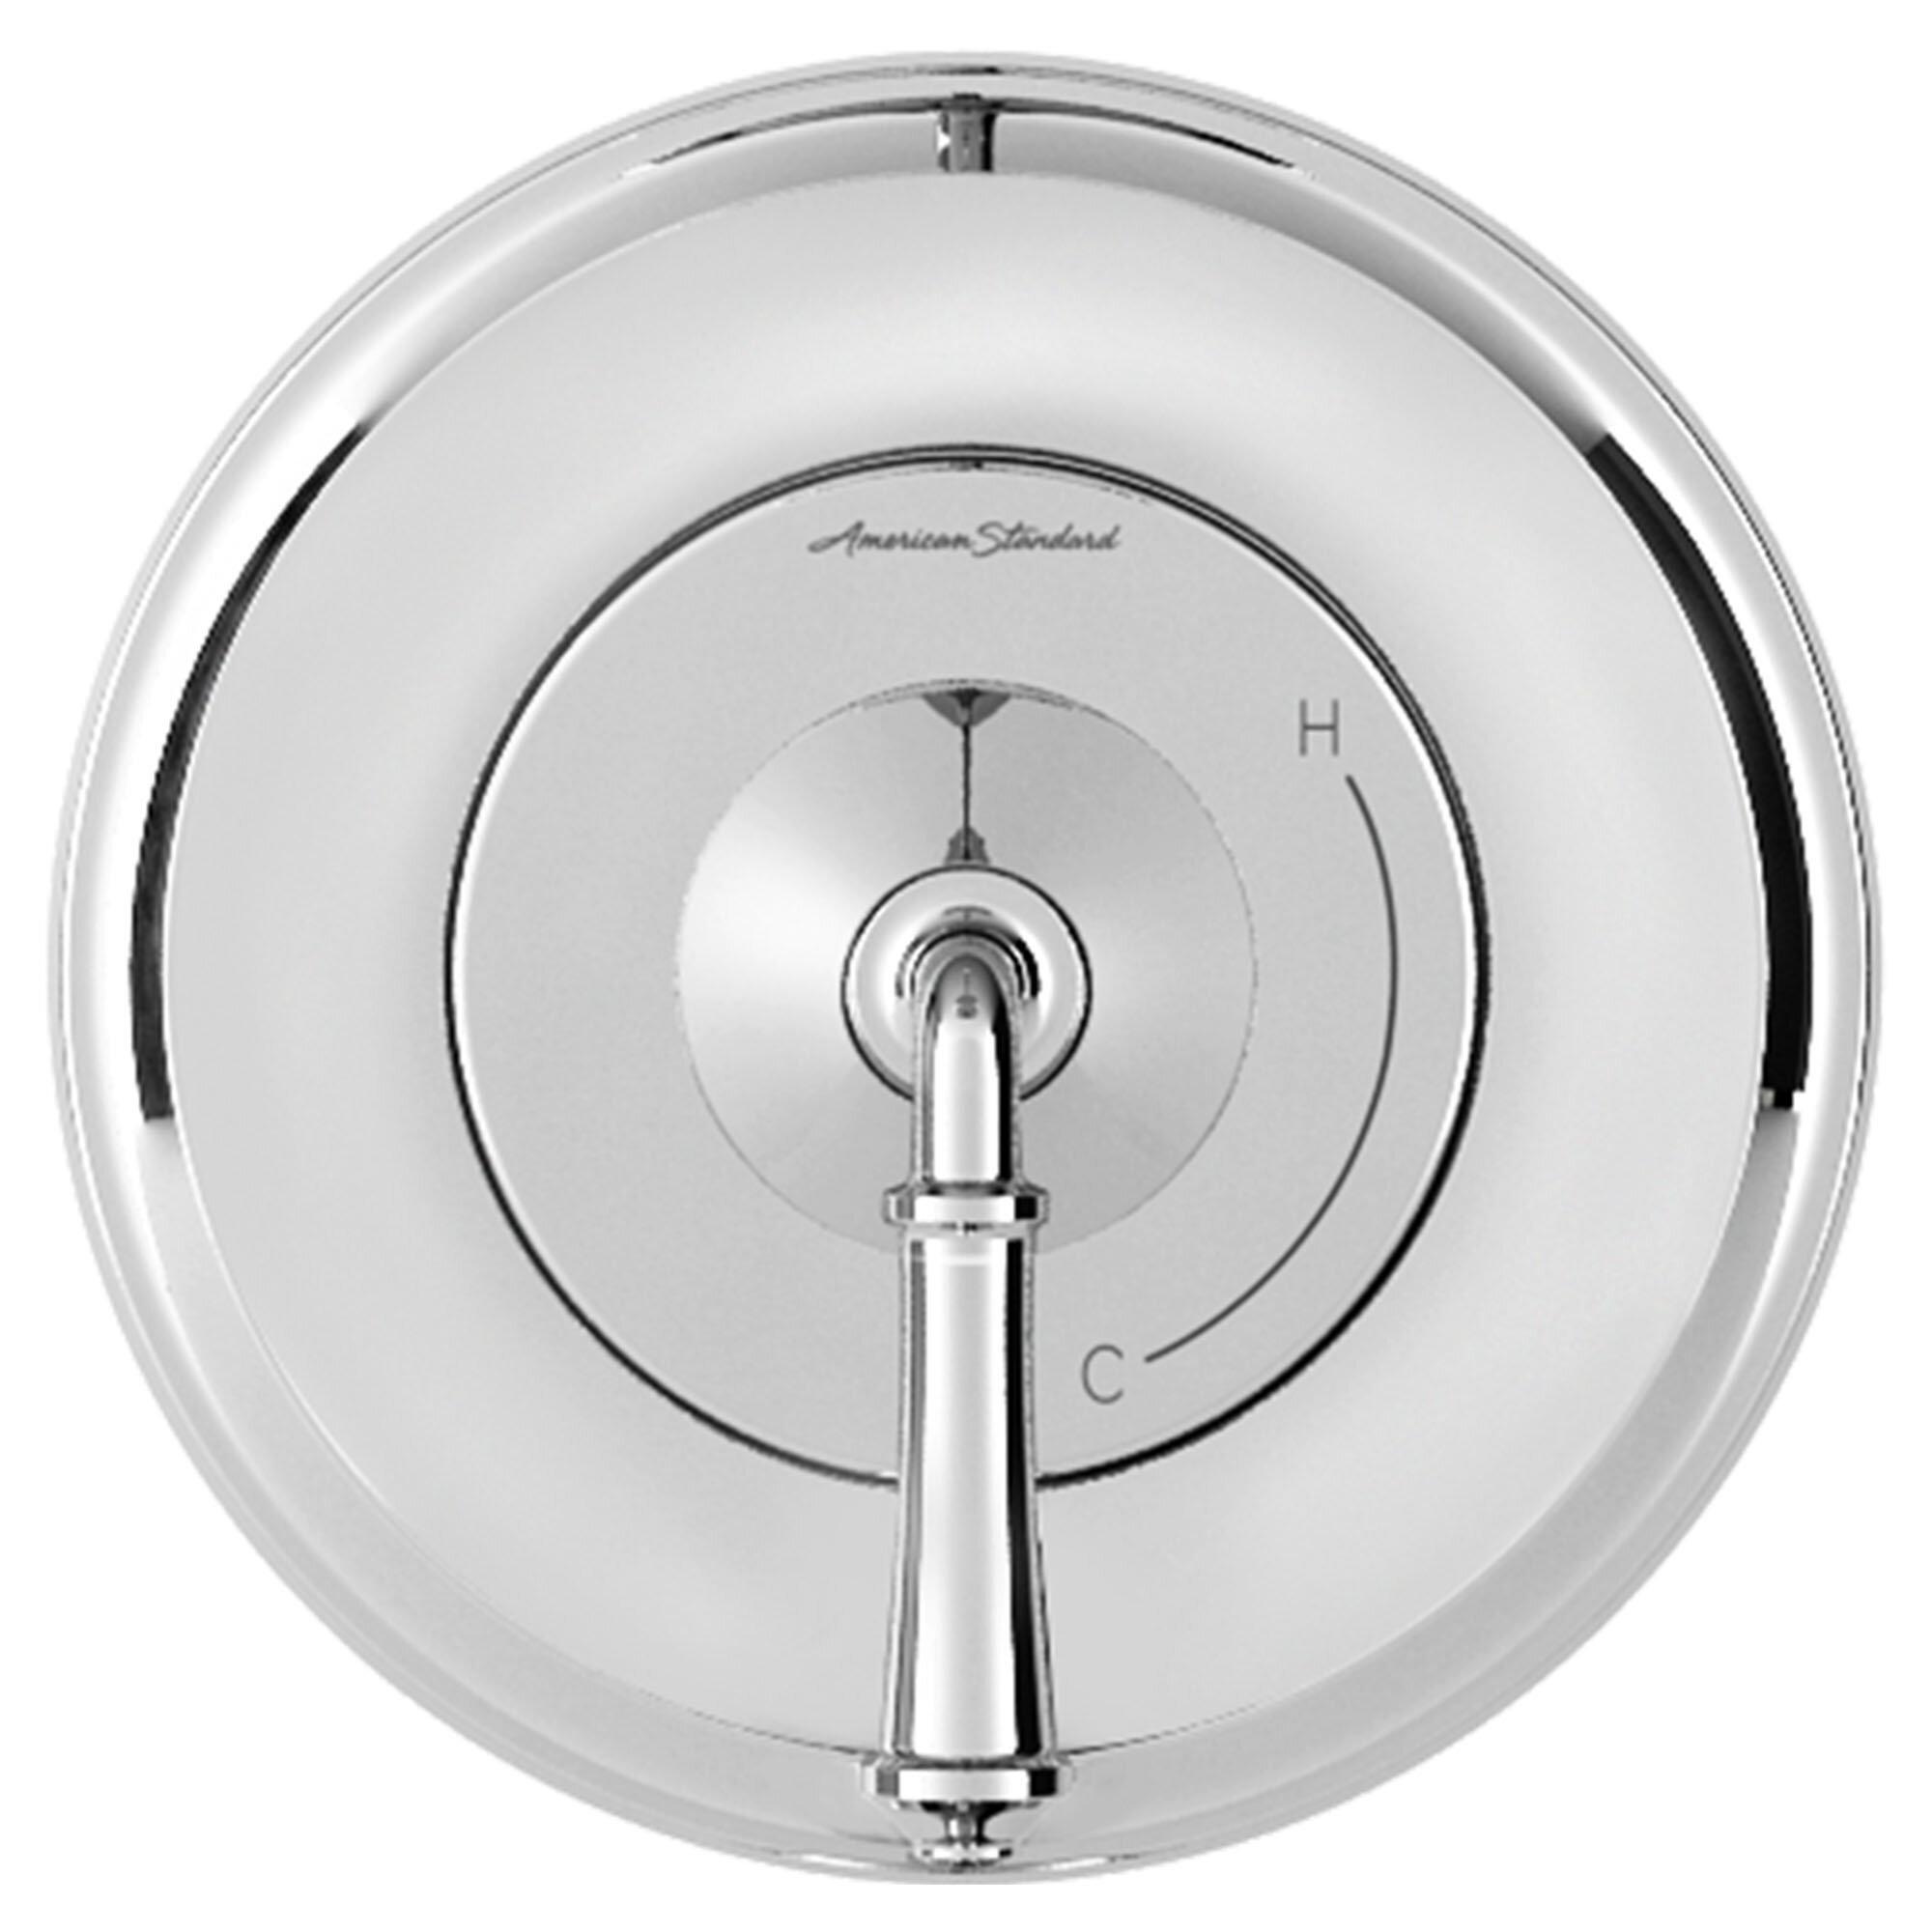 Delancey Volume Control Shower Faucet Trim With Cartridge